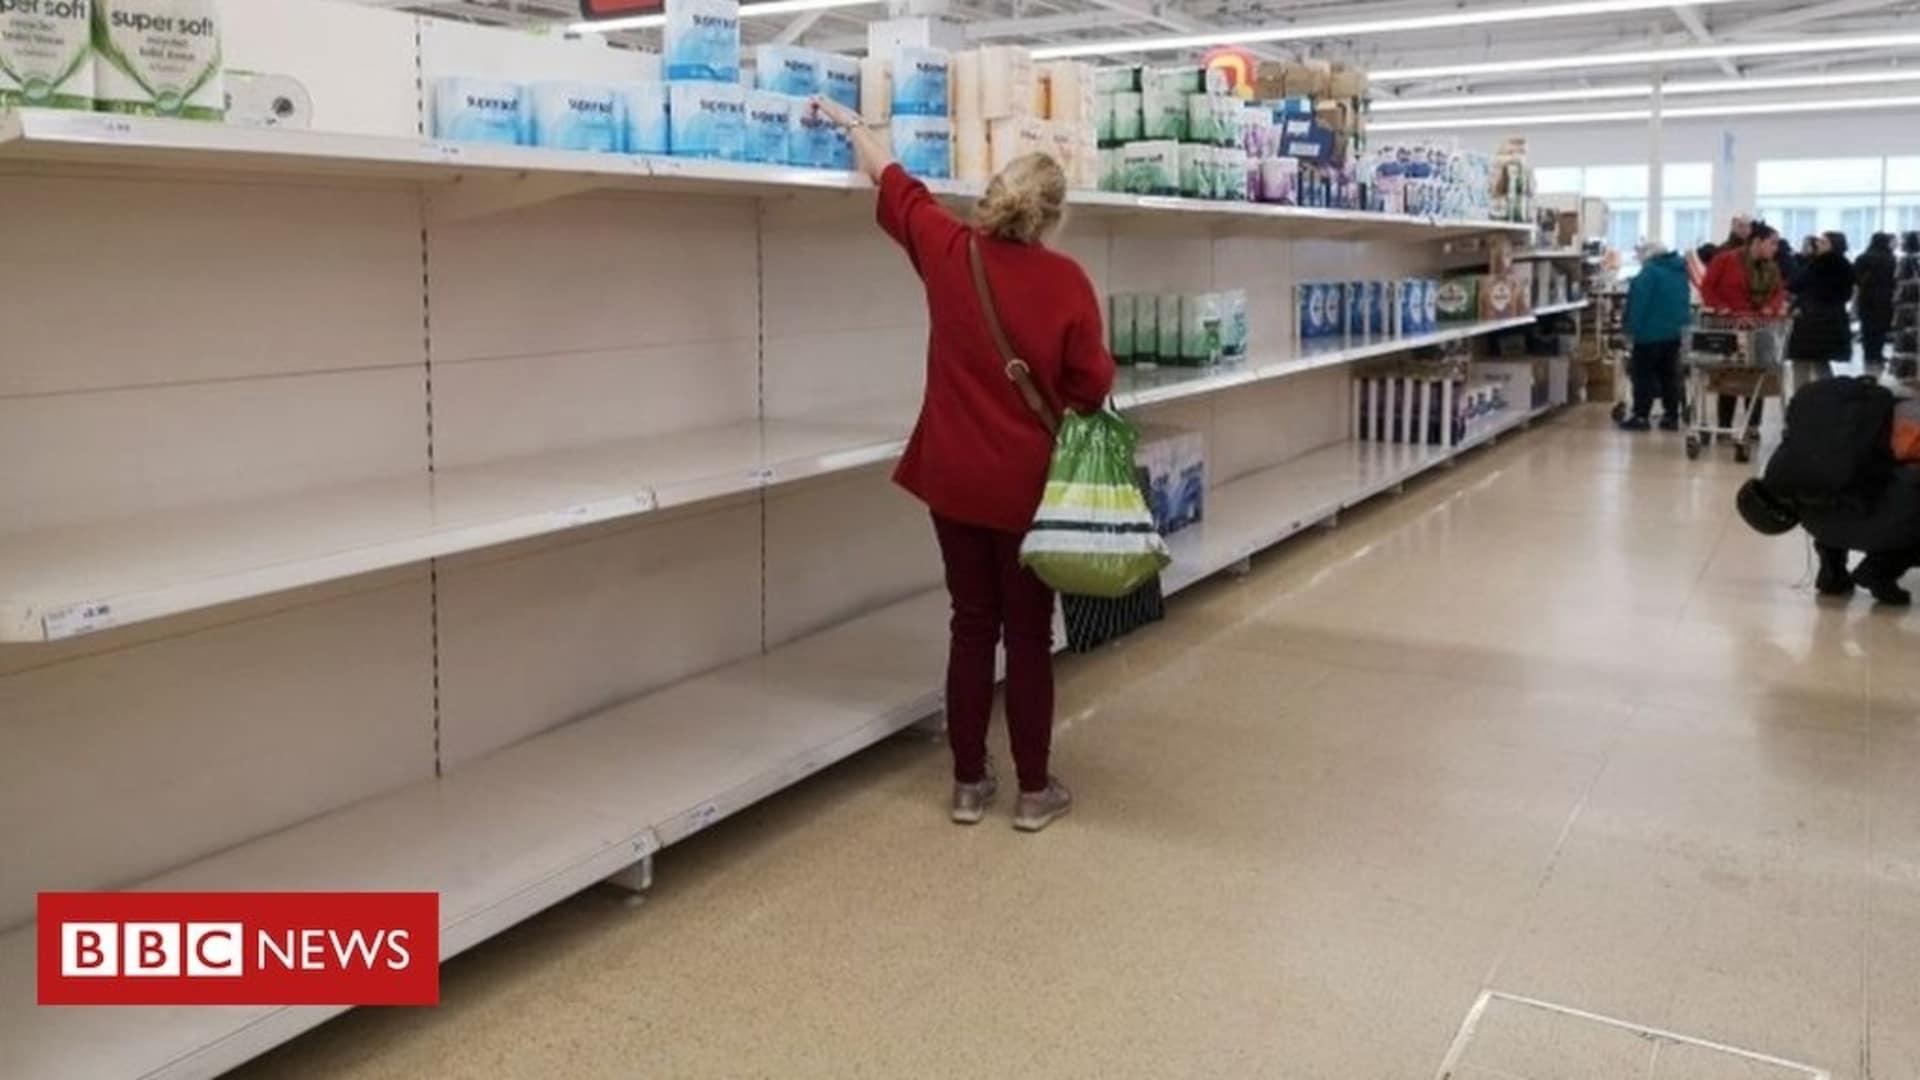 Coronavirus has led to empty shelves in supermarkets